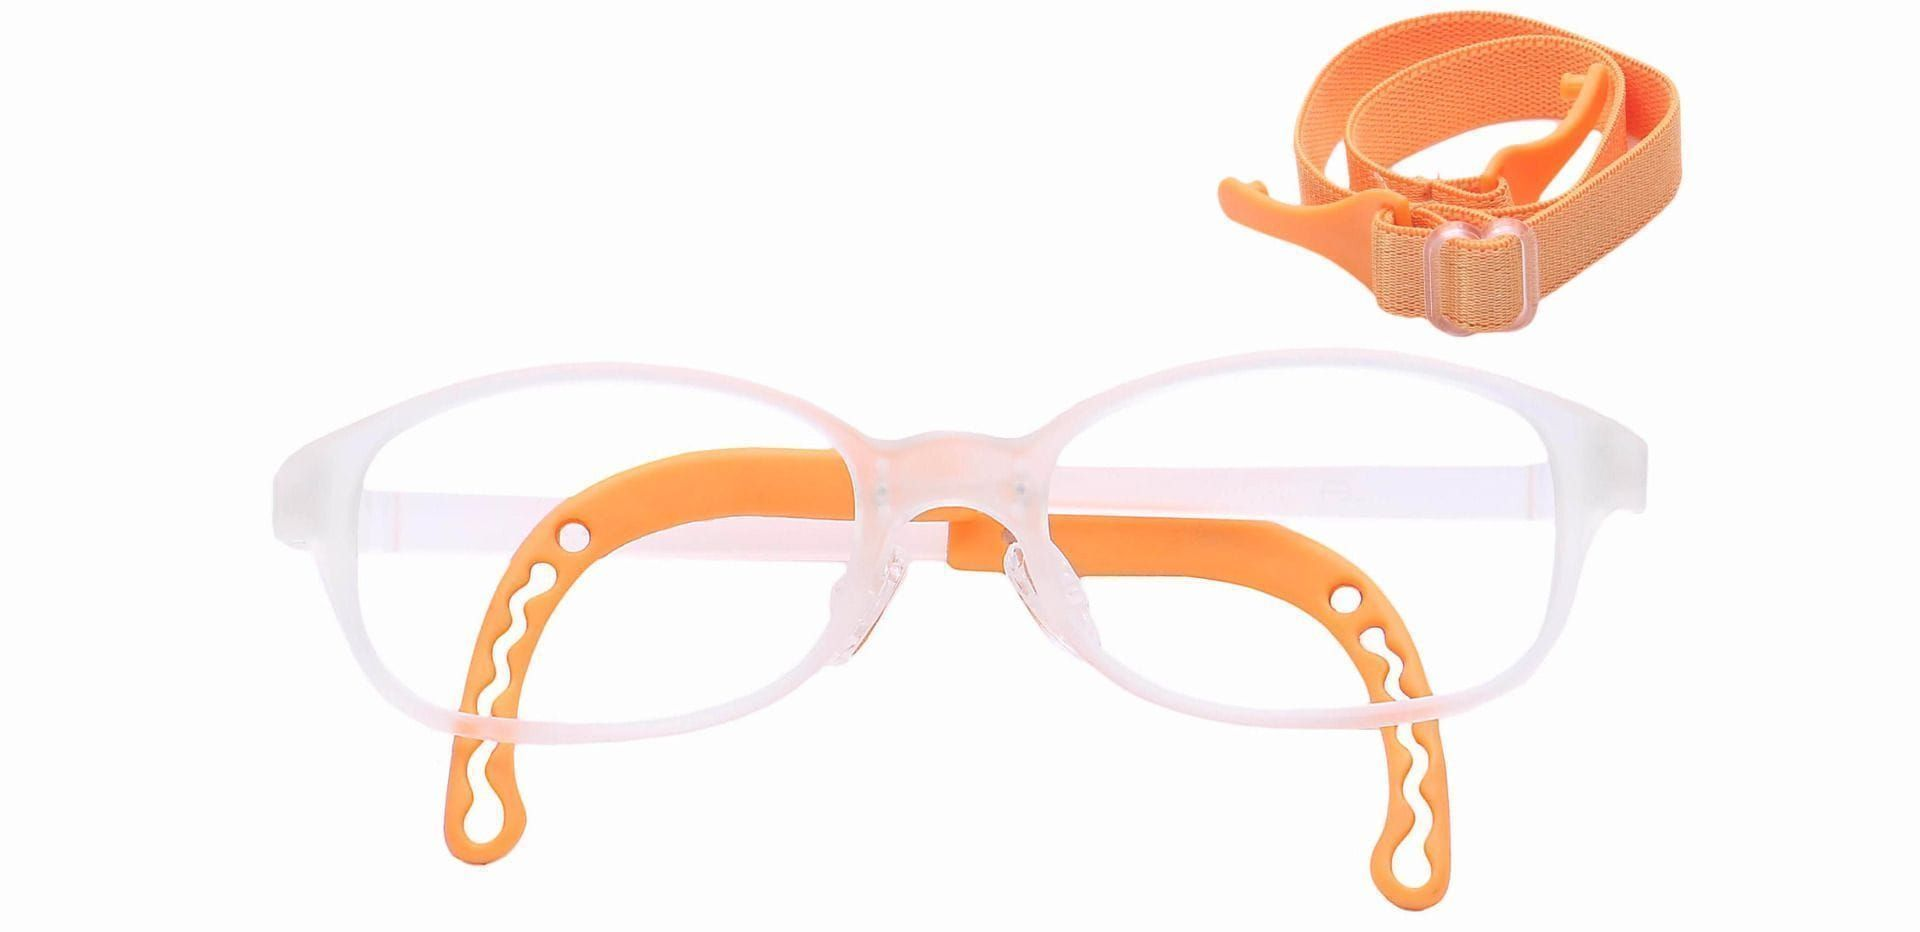 Dainty Rectangle Eyeglasses Frame - Orange